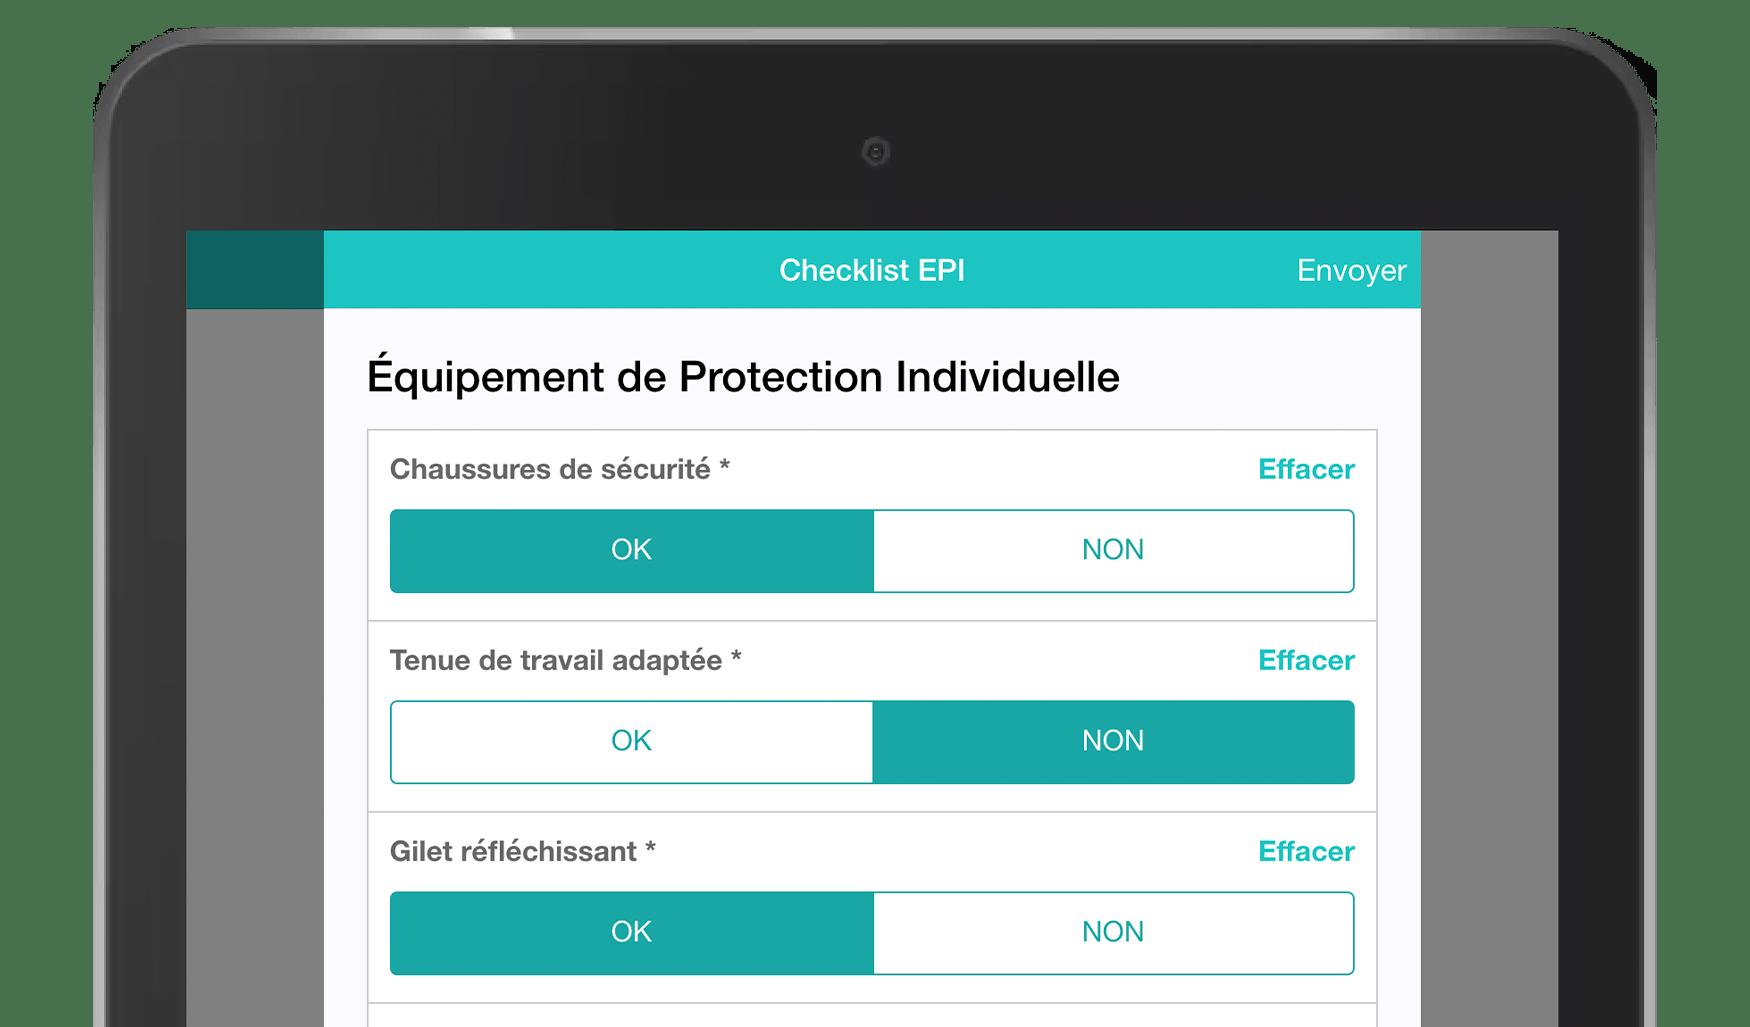 Application Formulaires Checklist EPI MoreApp